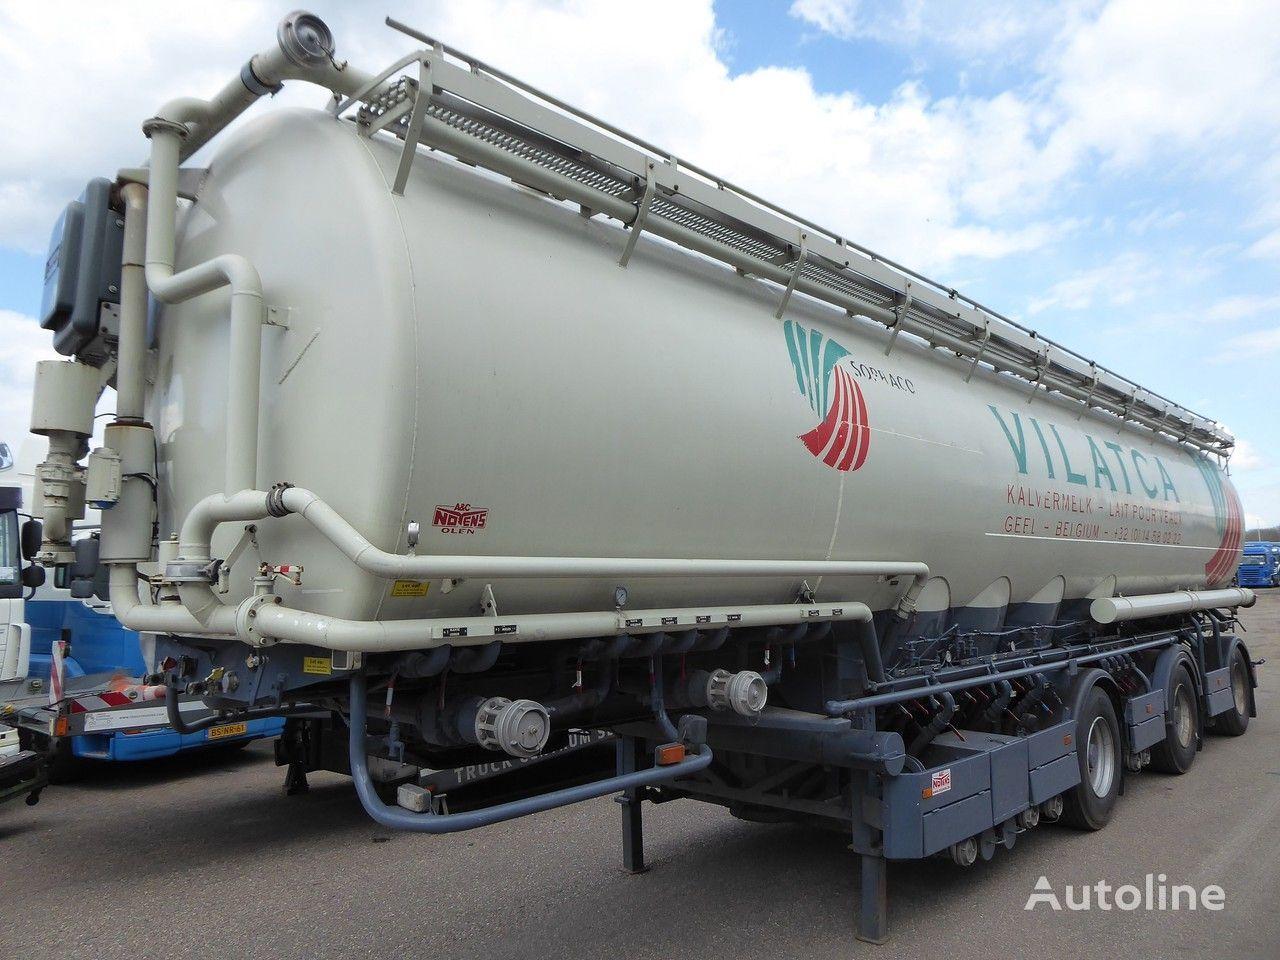 WELGRO 91 WLS 40 -27 Volume 58 m3, 8 comp, Cereals/ Getreide, Futter, M food tank trailer